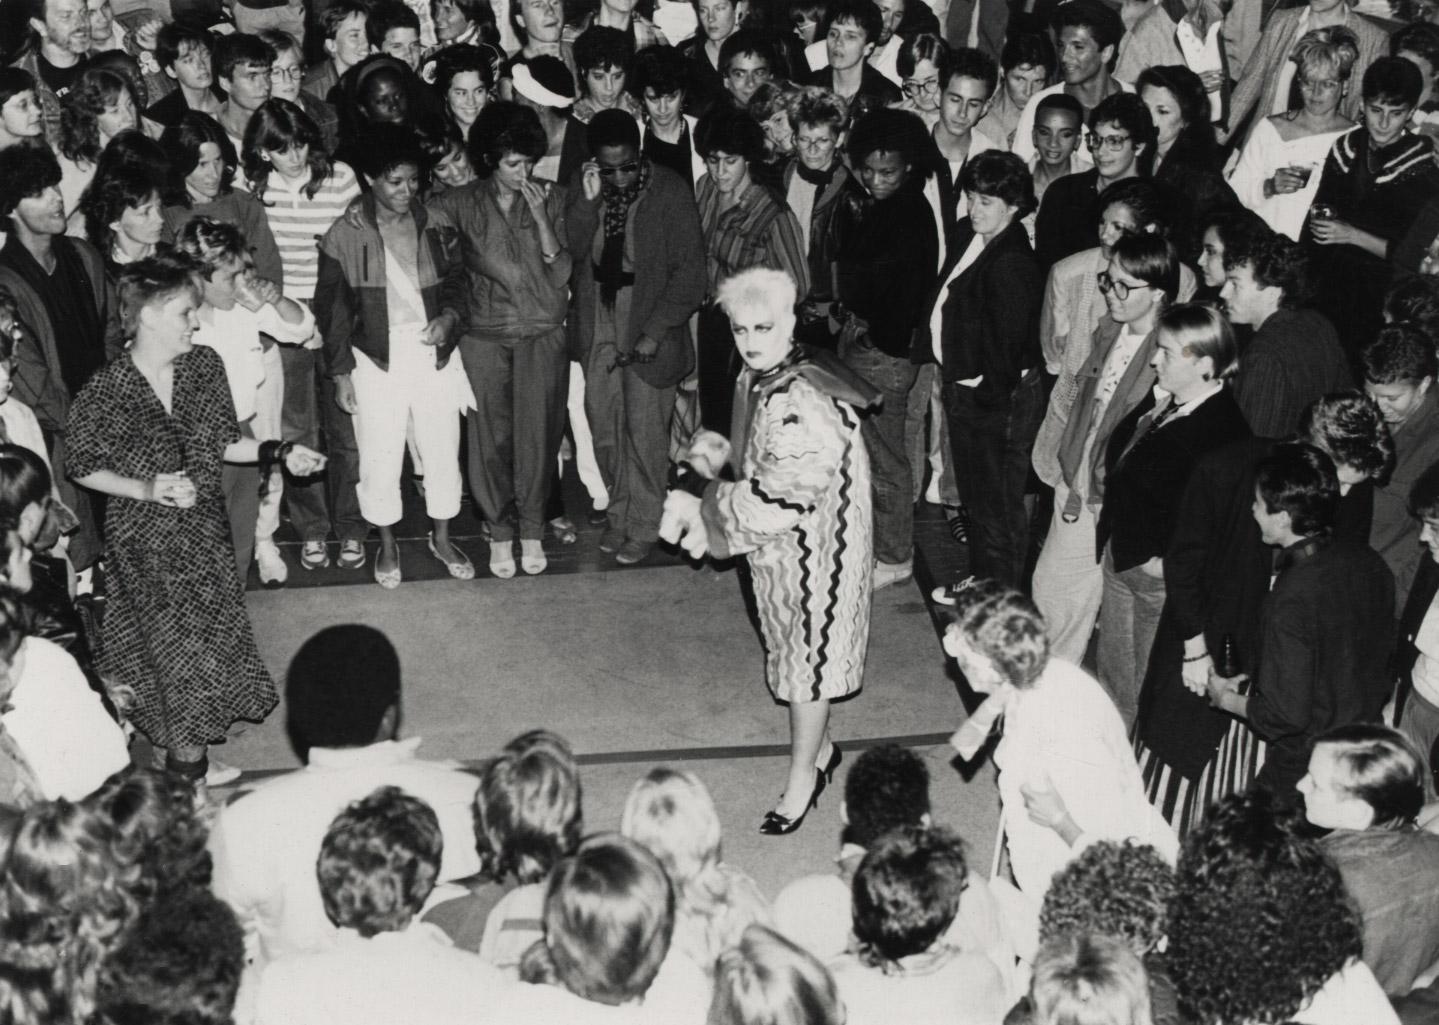 Mistress S — Bay Brick Inn, San Francisco, 1981